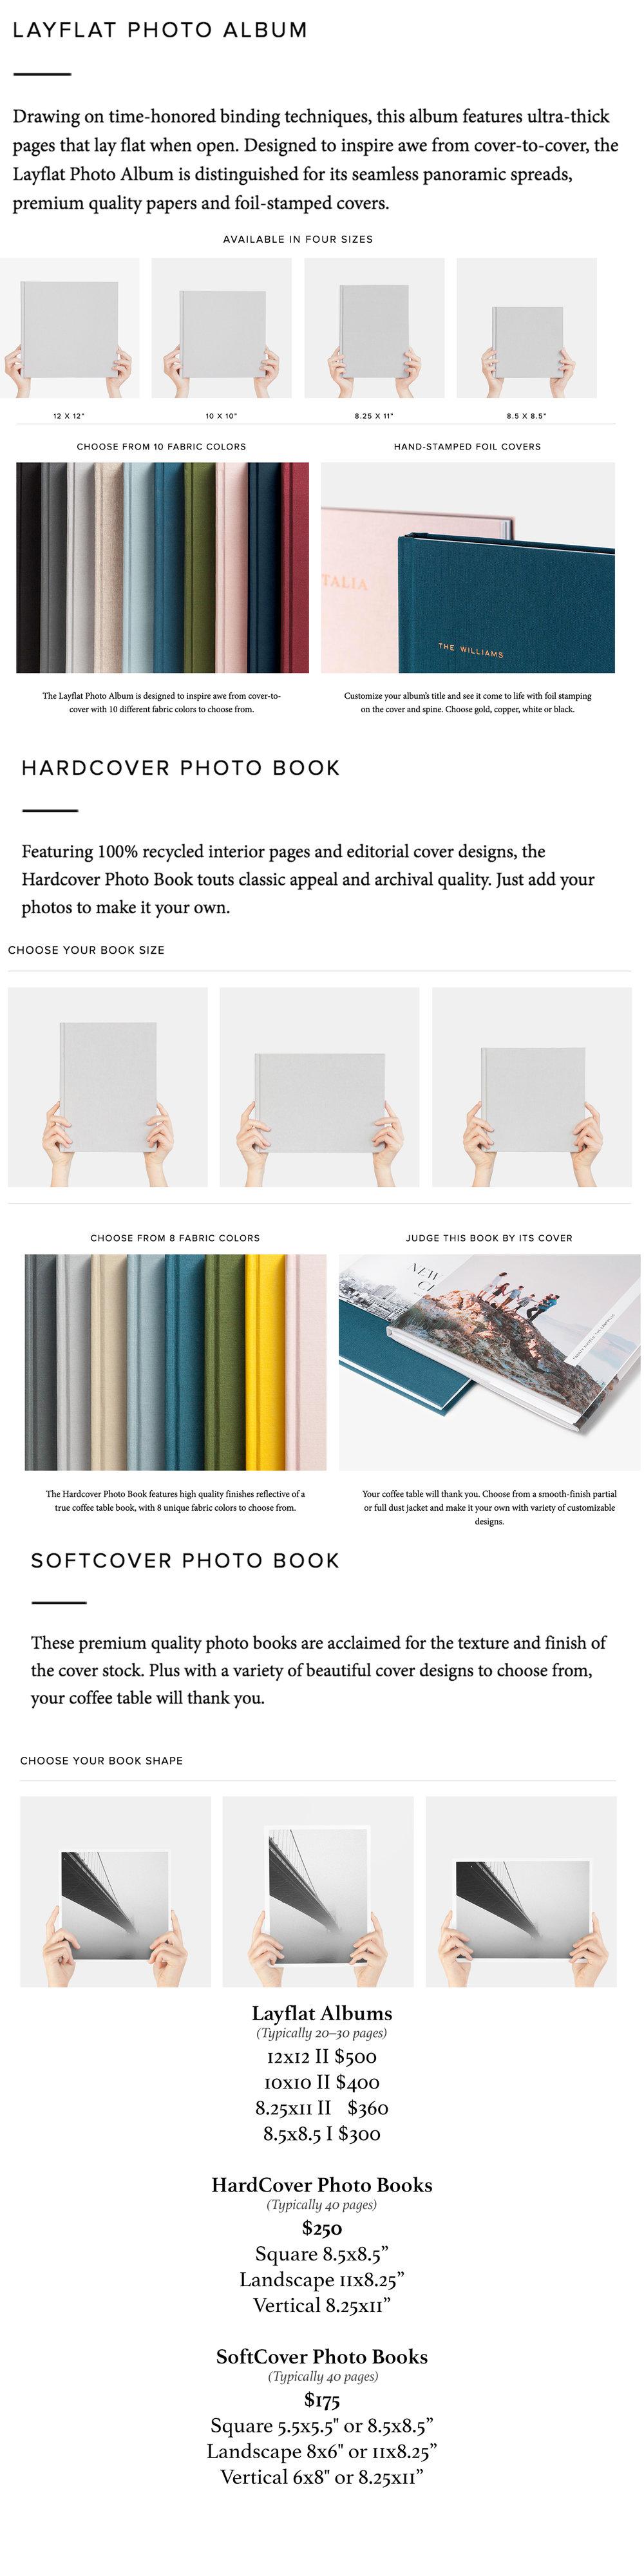 Photo Album Prices.jpg